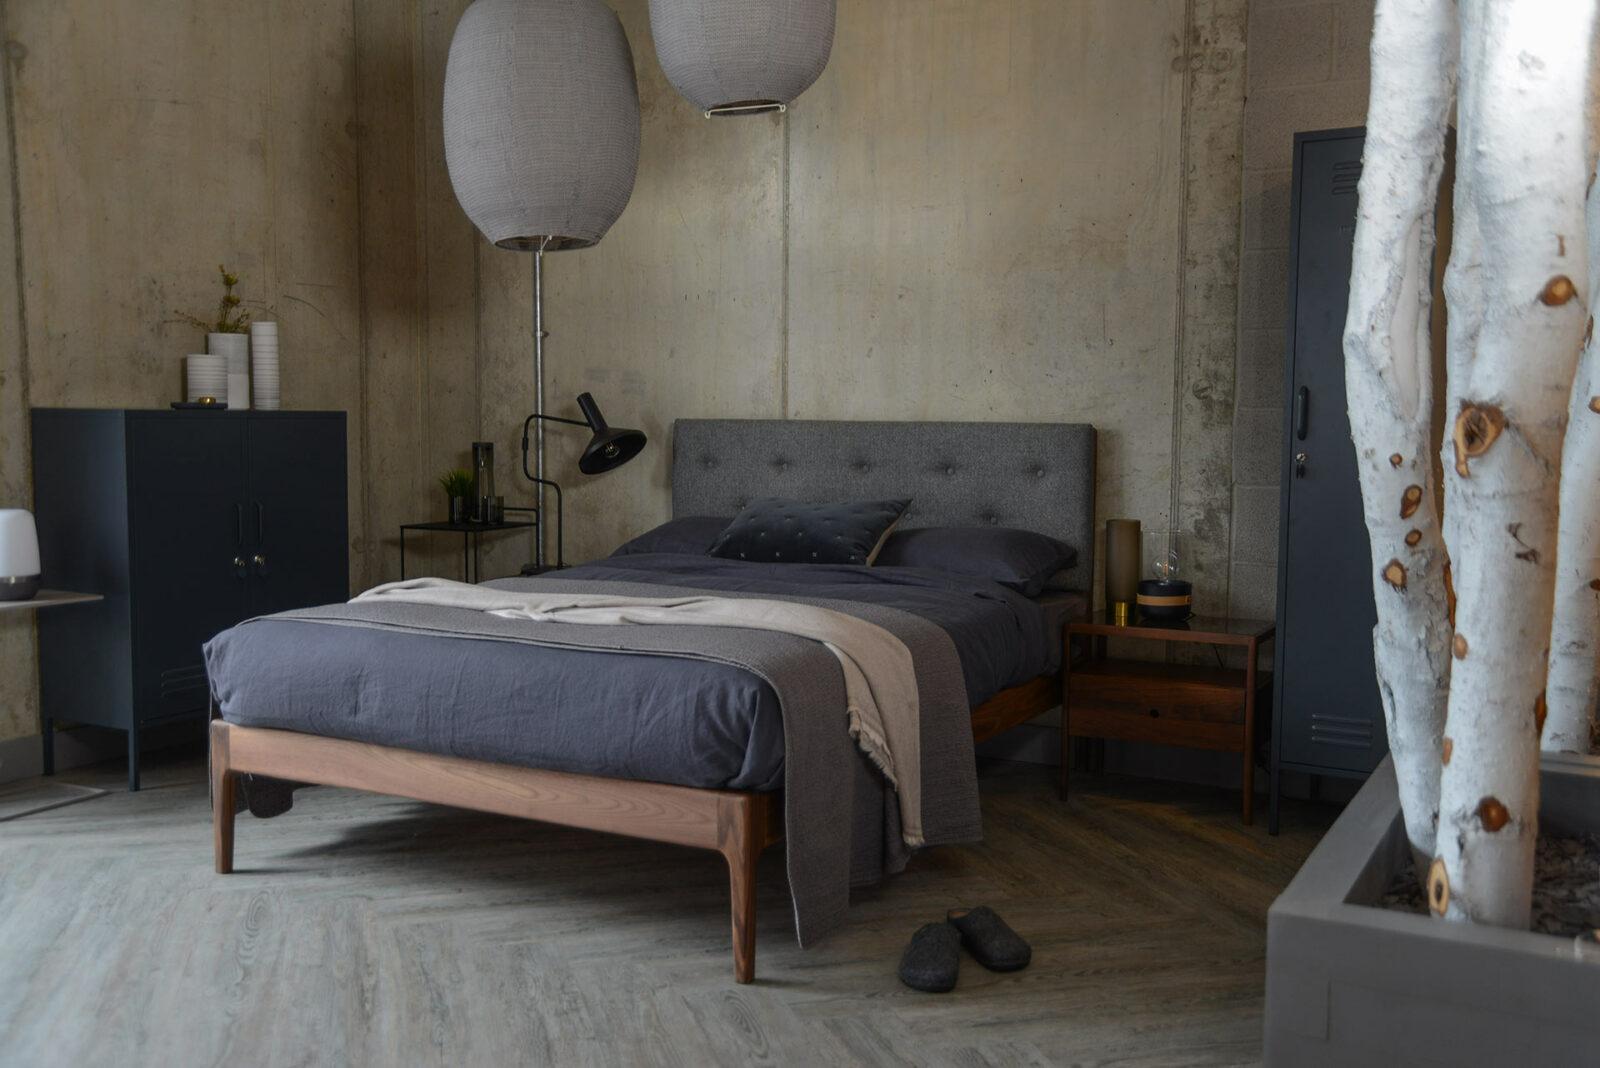 Industrial look bedroom with grey locker storage and grey bedding.